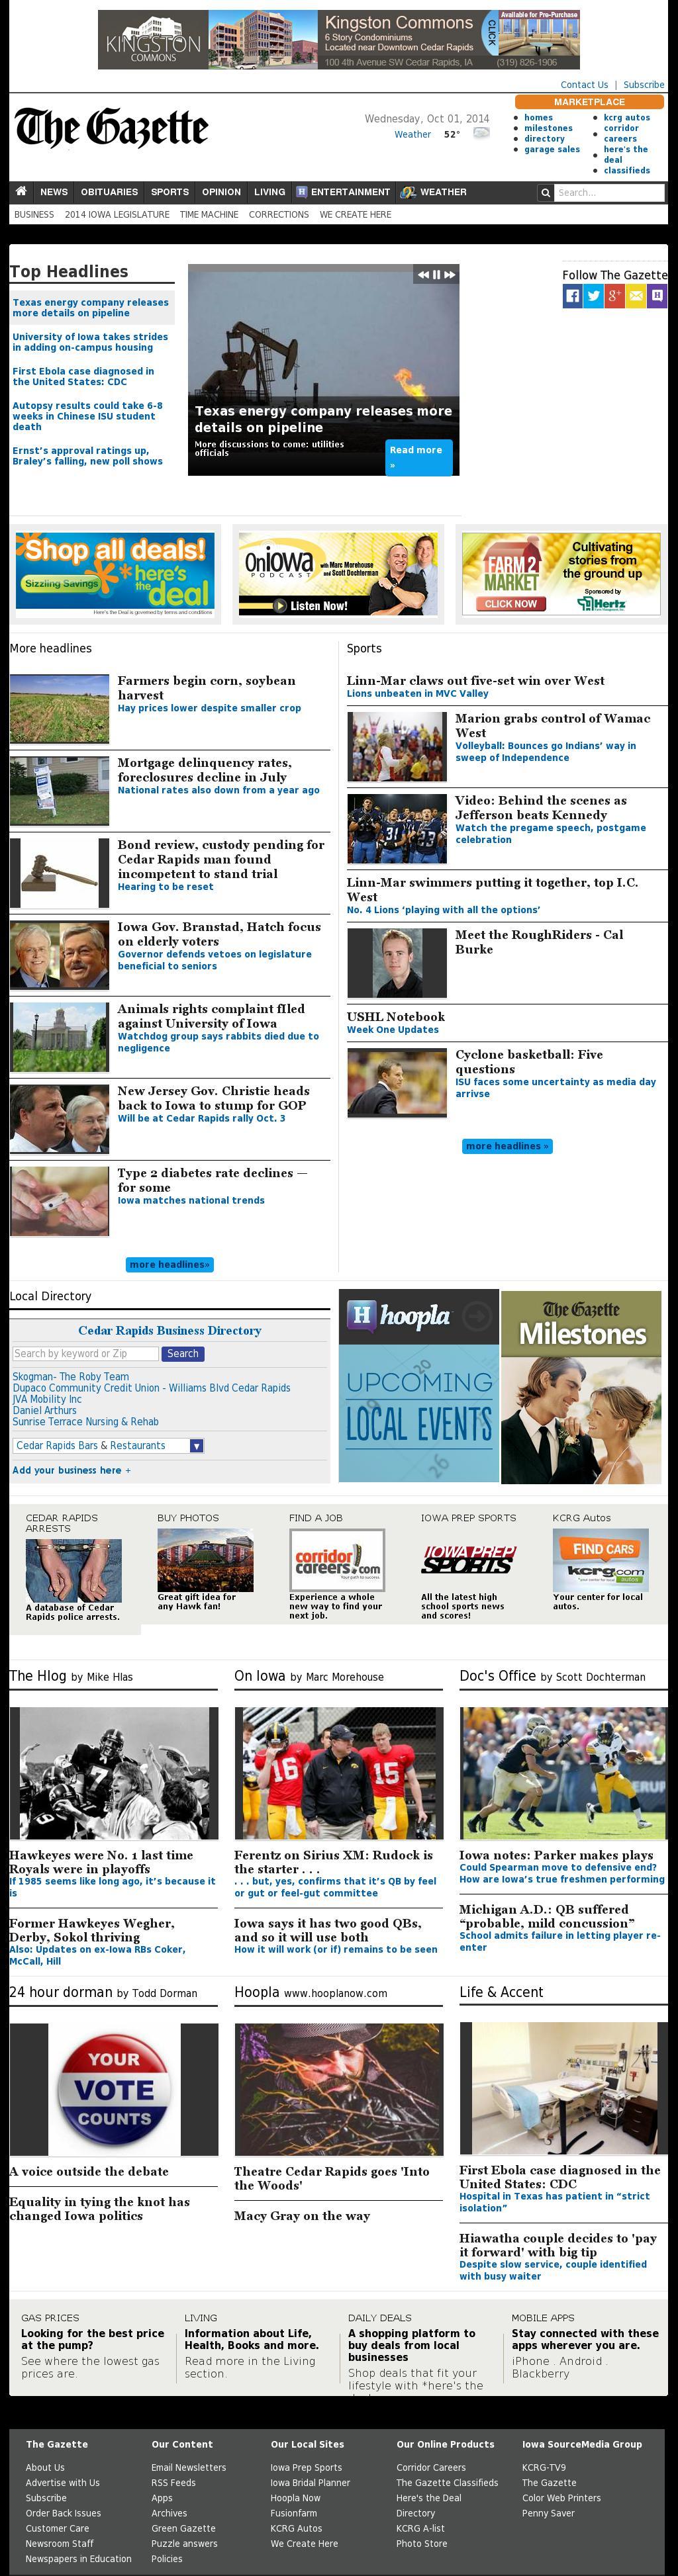 The (Cedar Rapids) Gazette at Wednesday Oct. 1, 2014, 1:05 p.m. UTC